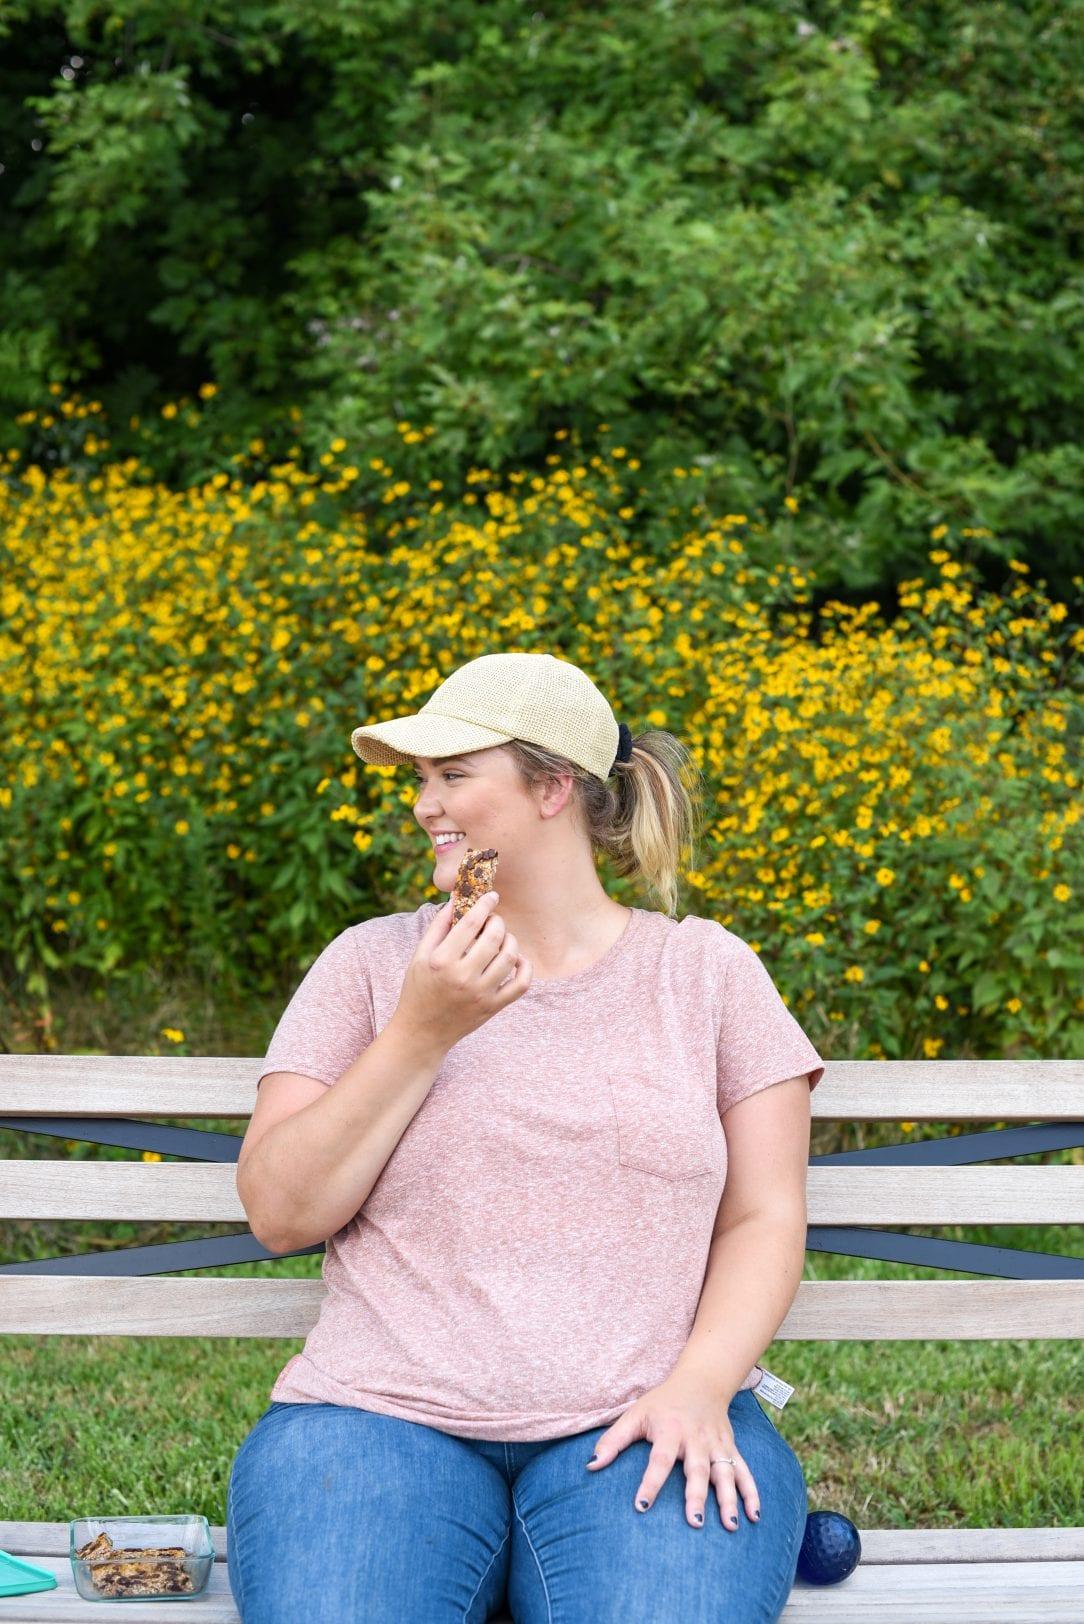 sitting on park bench eating granola bar